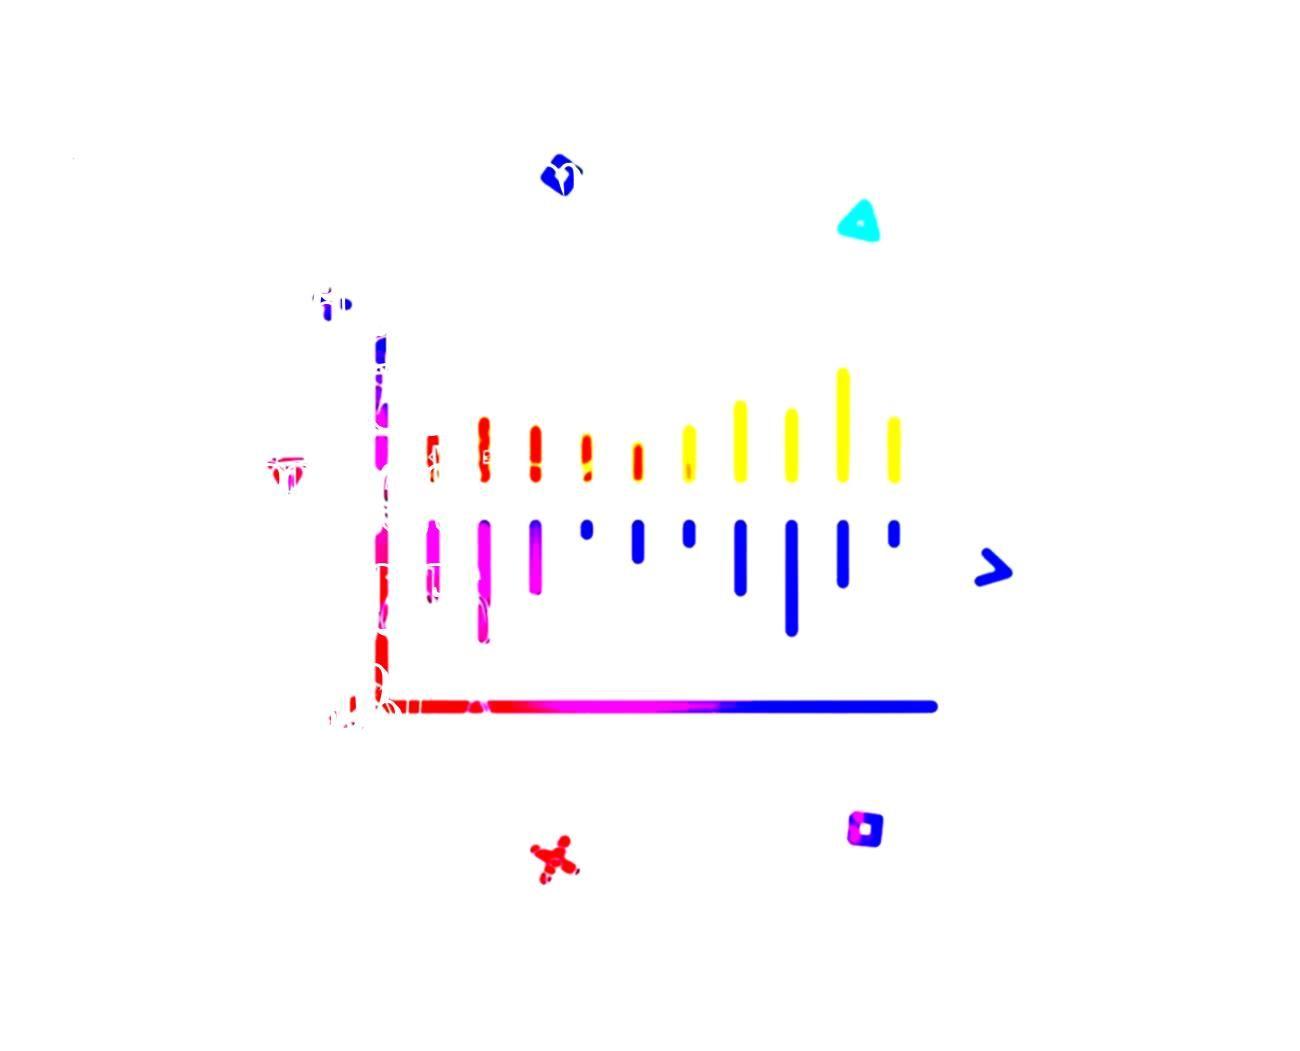 Illustration Symbolcolumn Shapeschart Shapesicon Investment Vectorline Financial Geometric Colorful Gradient Business Shcharti Exchange Shchart D 2020